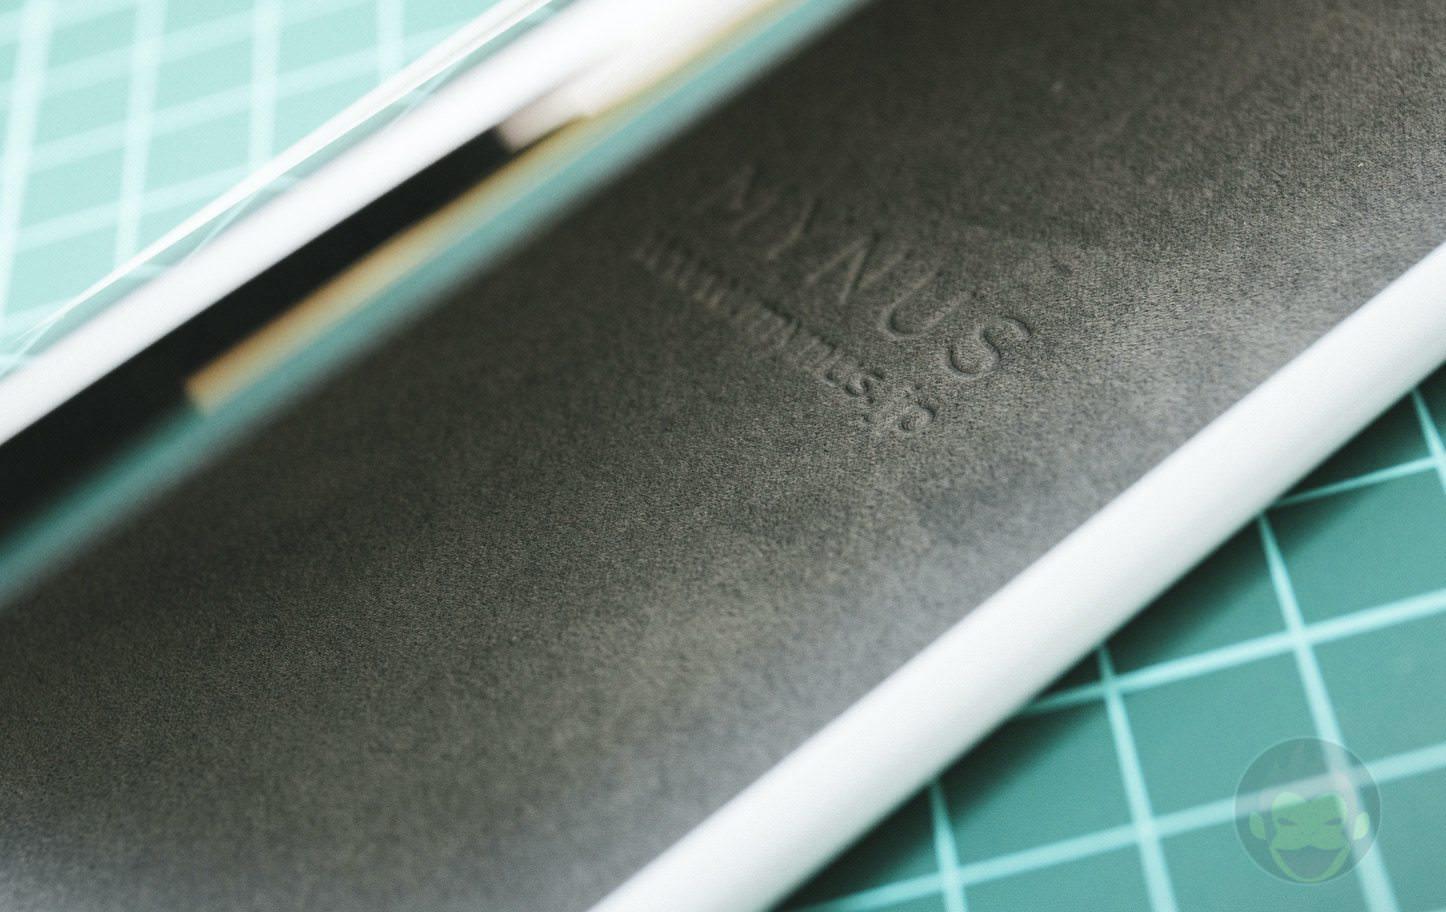 Mynus-iPhoneX-Case-Black-White-18.jpg